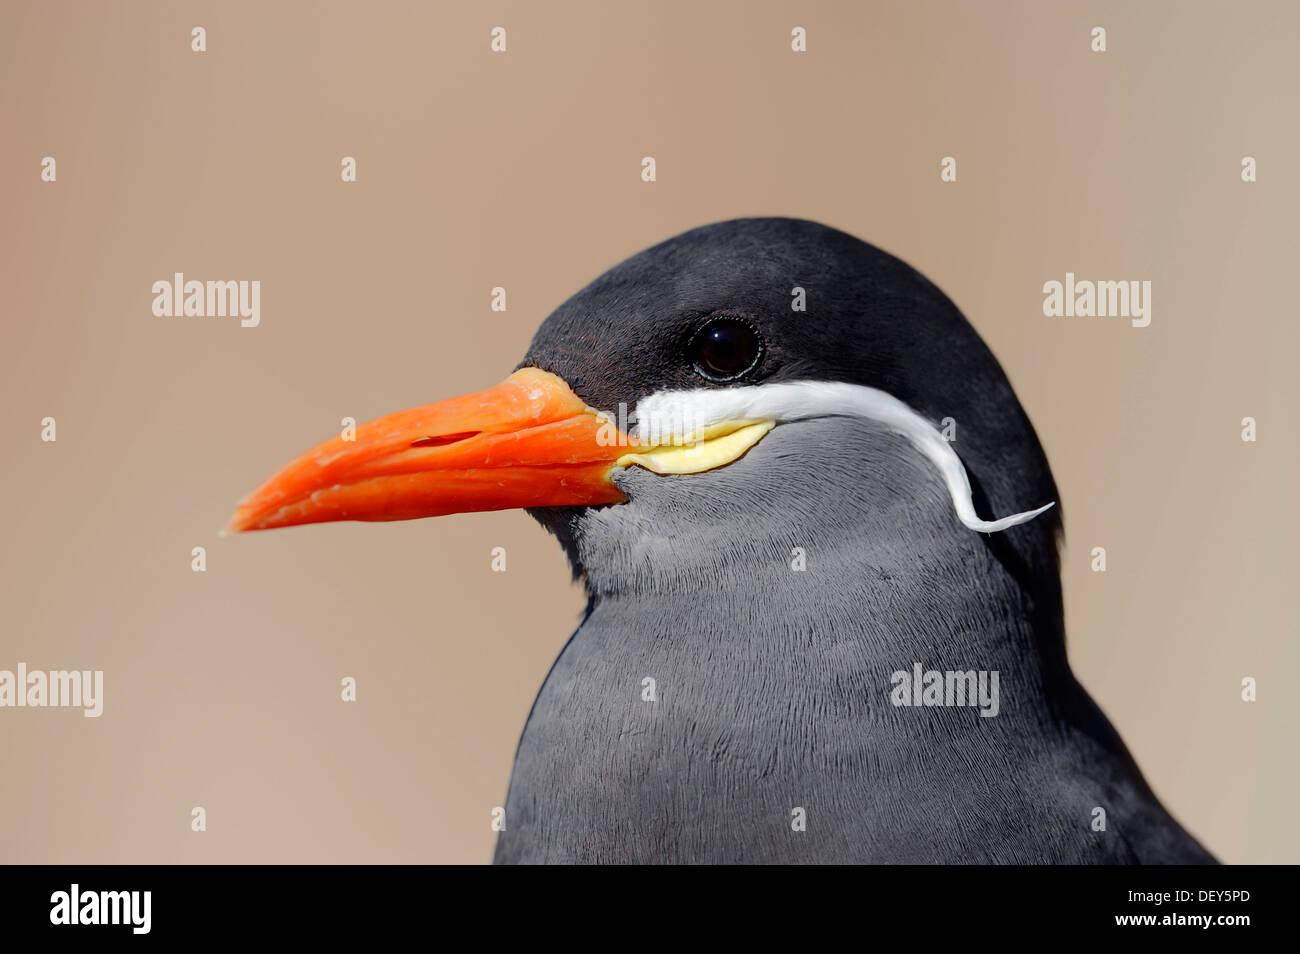 Inca Tern (Larosterna inca), portrait, occurrence in South America, captive, The Netherlands Stock Photo